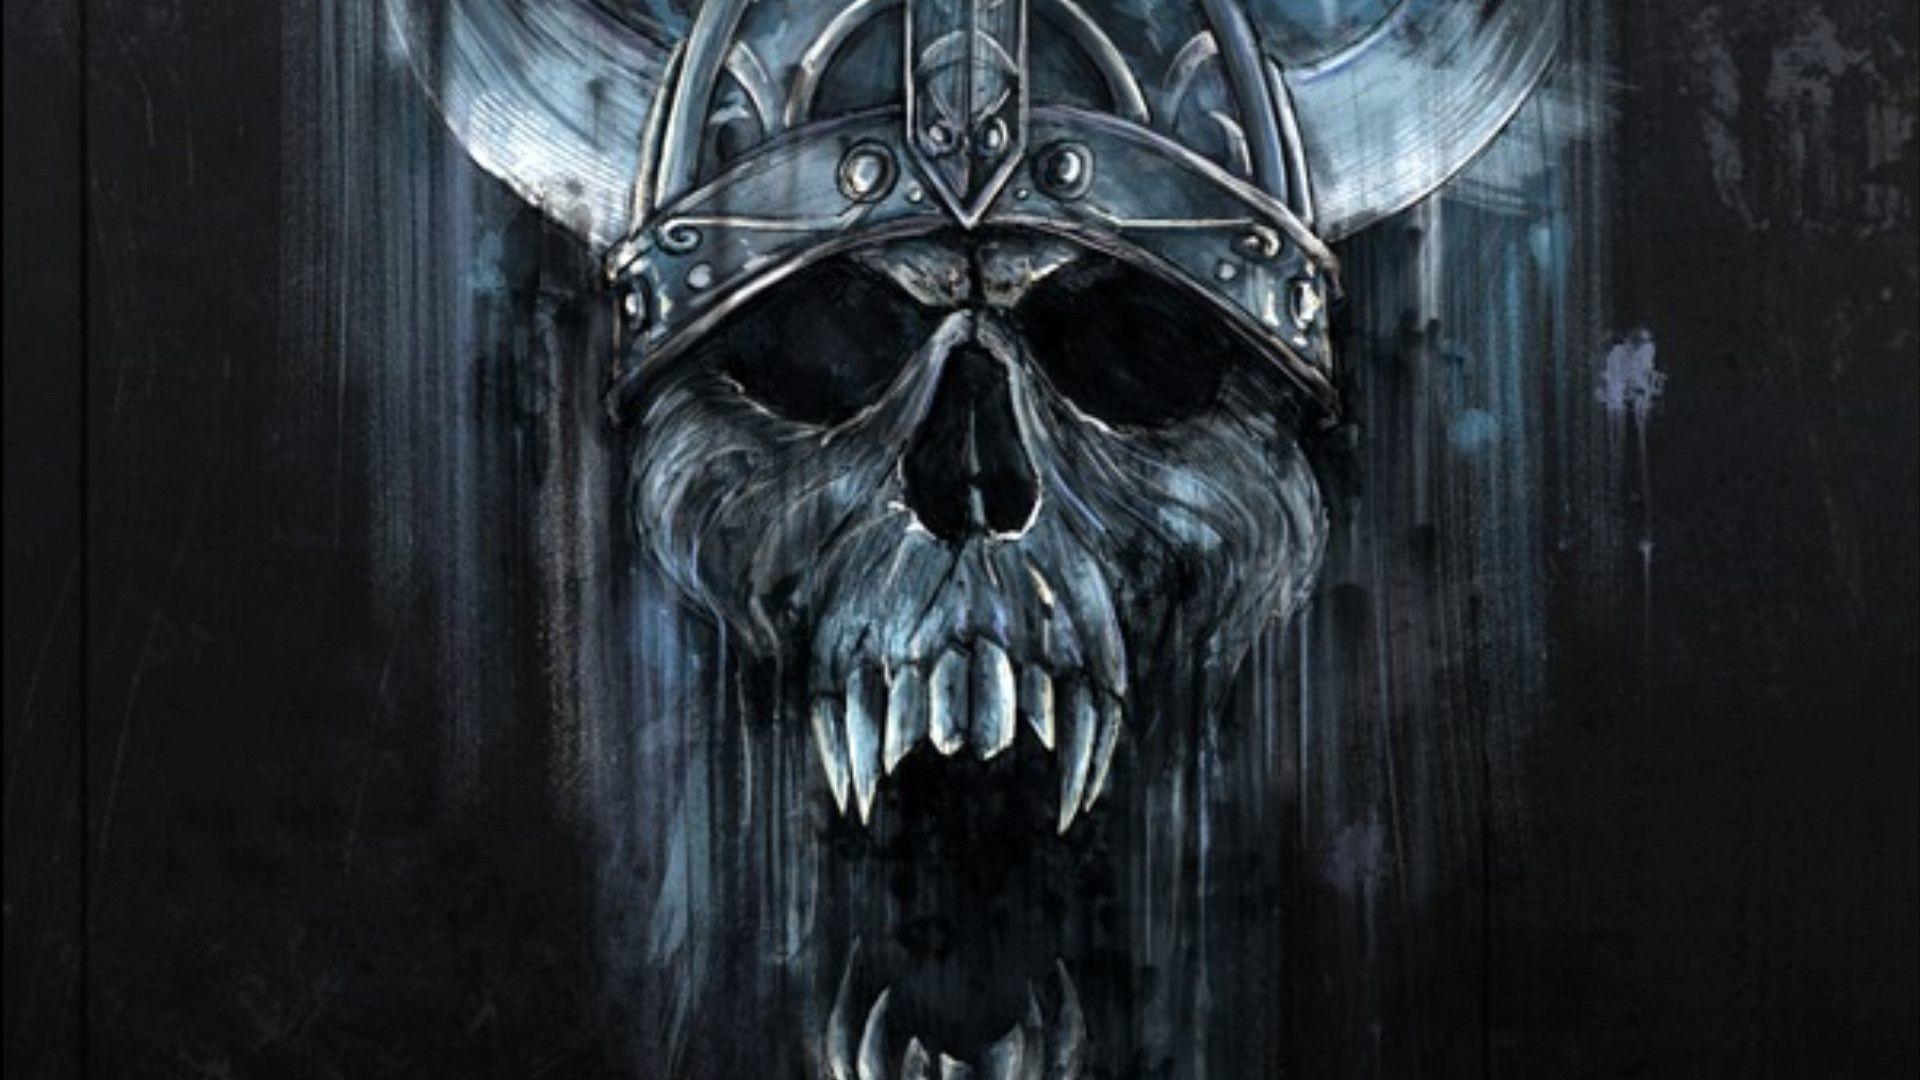 Skull wallpapers images 56 images 1920x1080 hd skull wallpapers wallpaper voltagebd Gallery